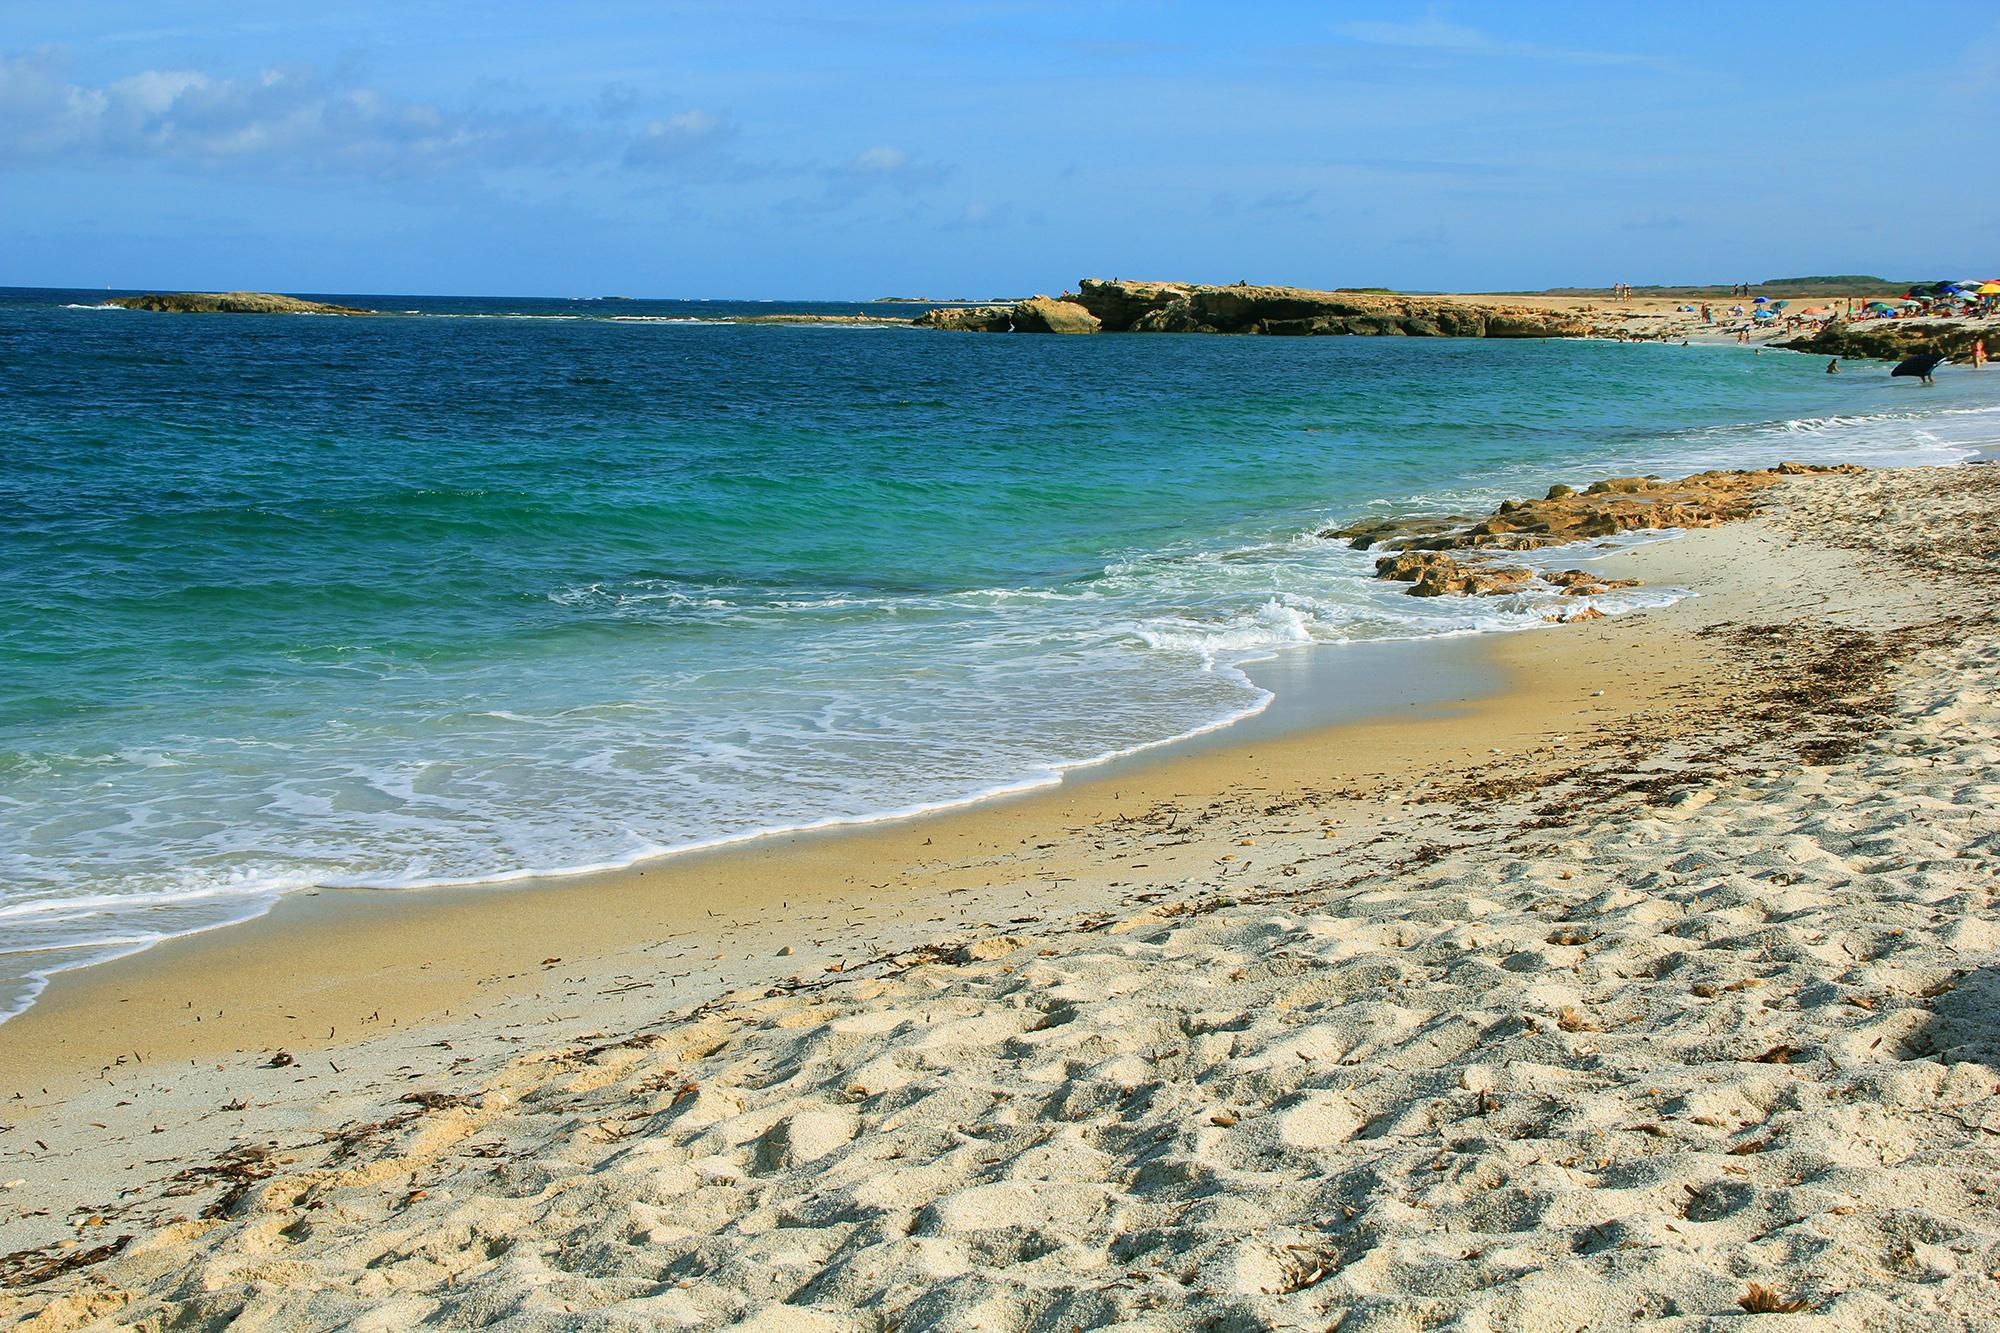 Is Arutas spiaggia